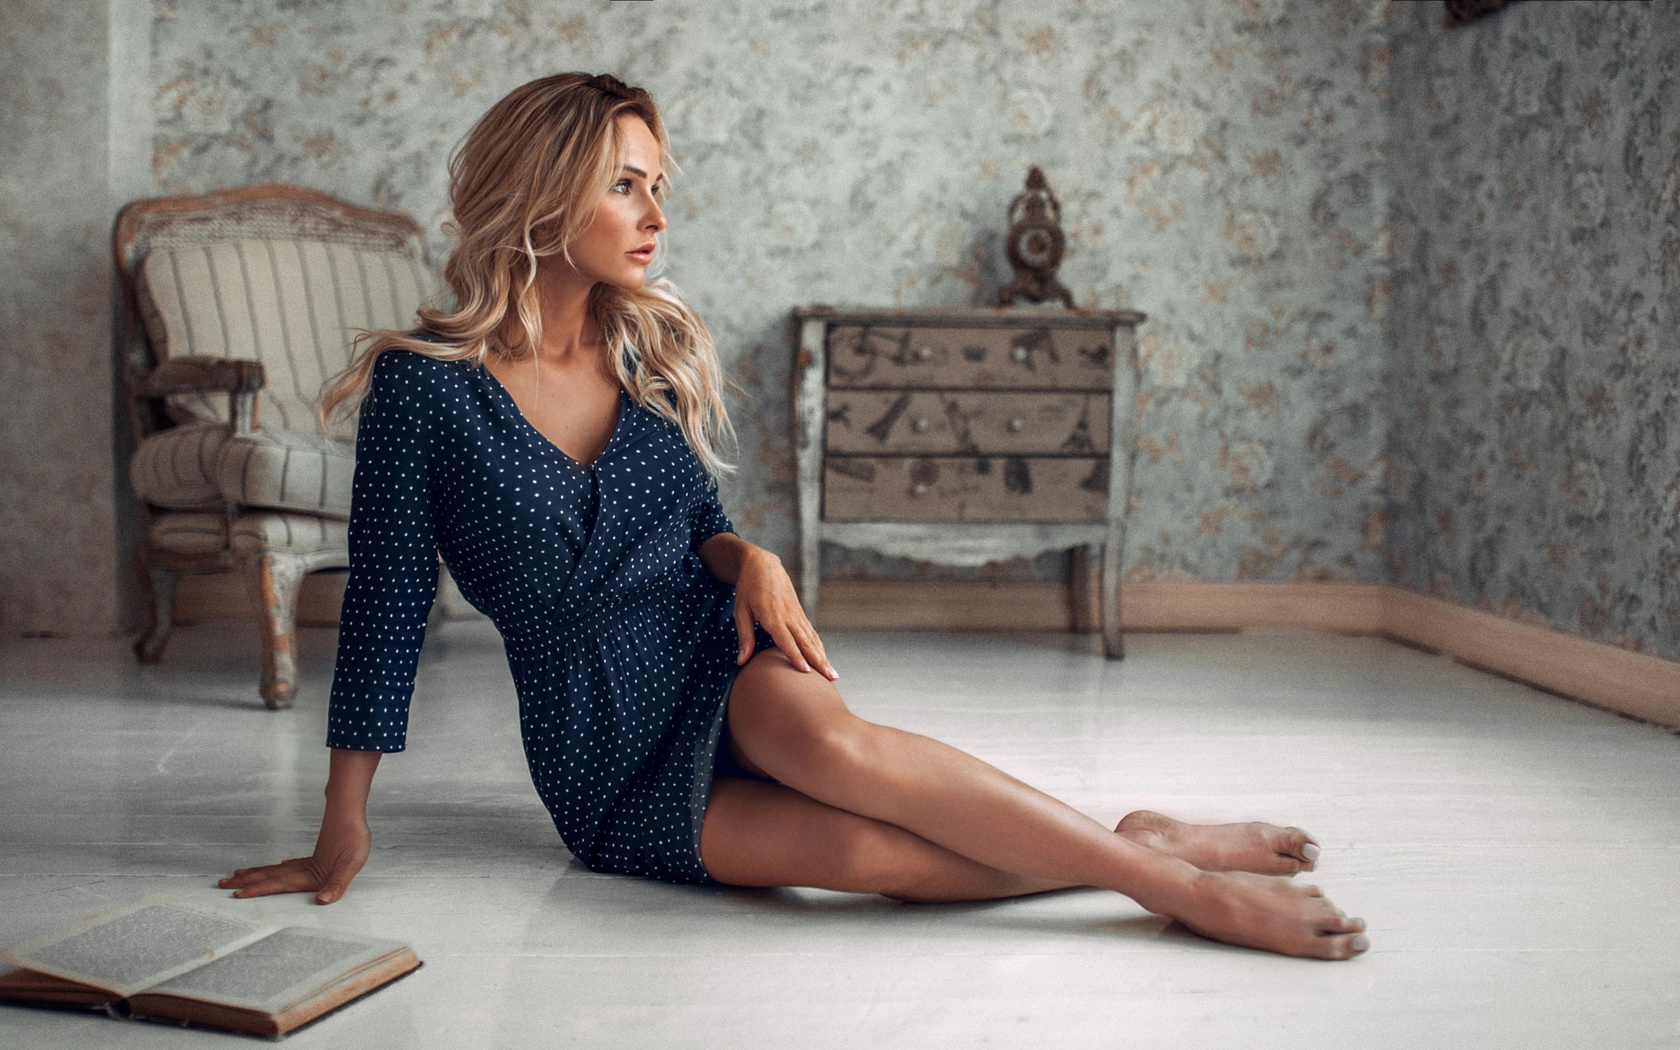 alexey slesarev, девушка, блондинка, платье, комната, комод, кресло, книга